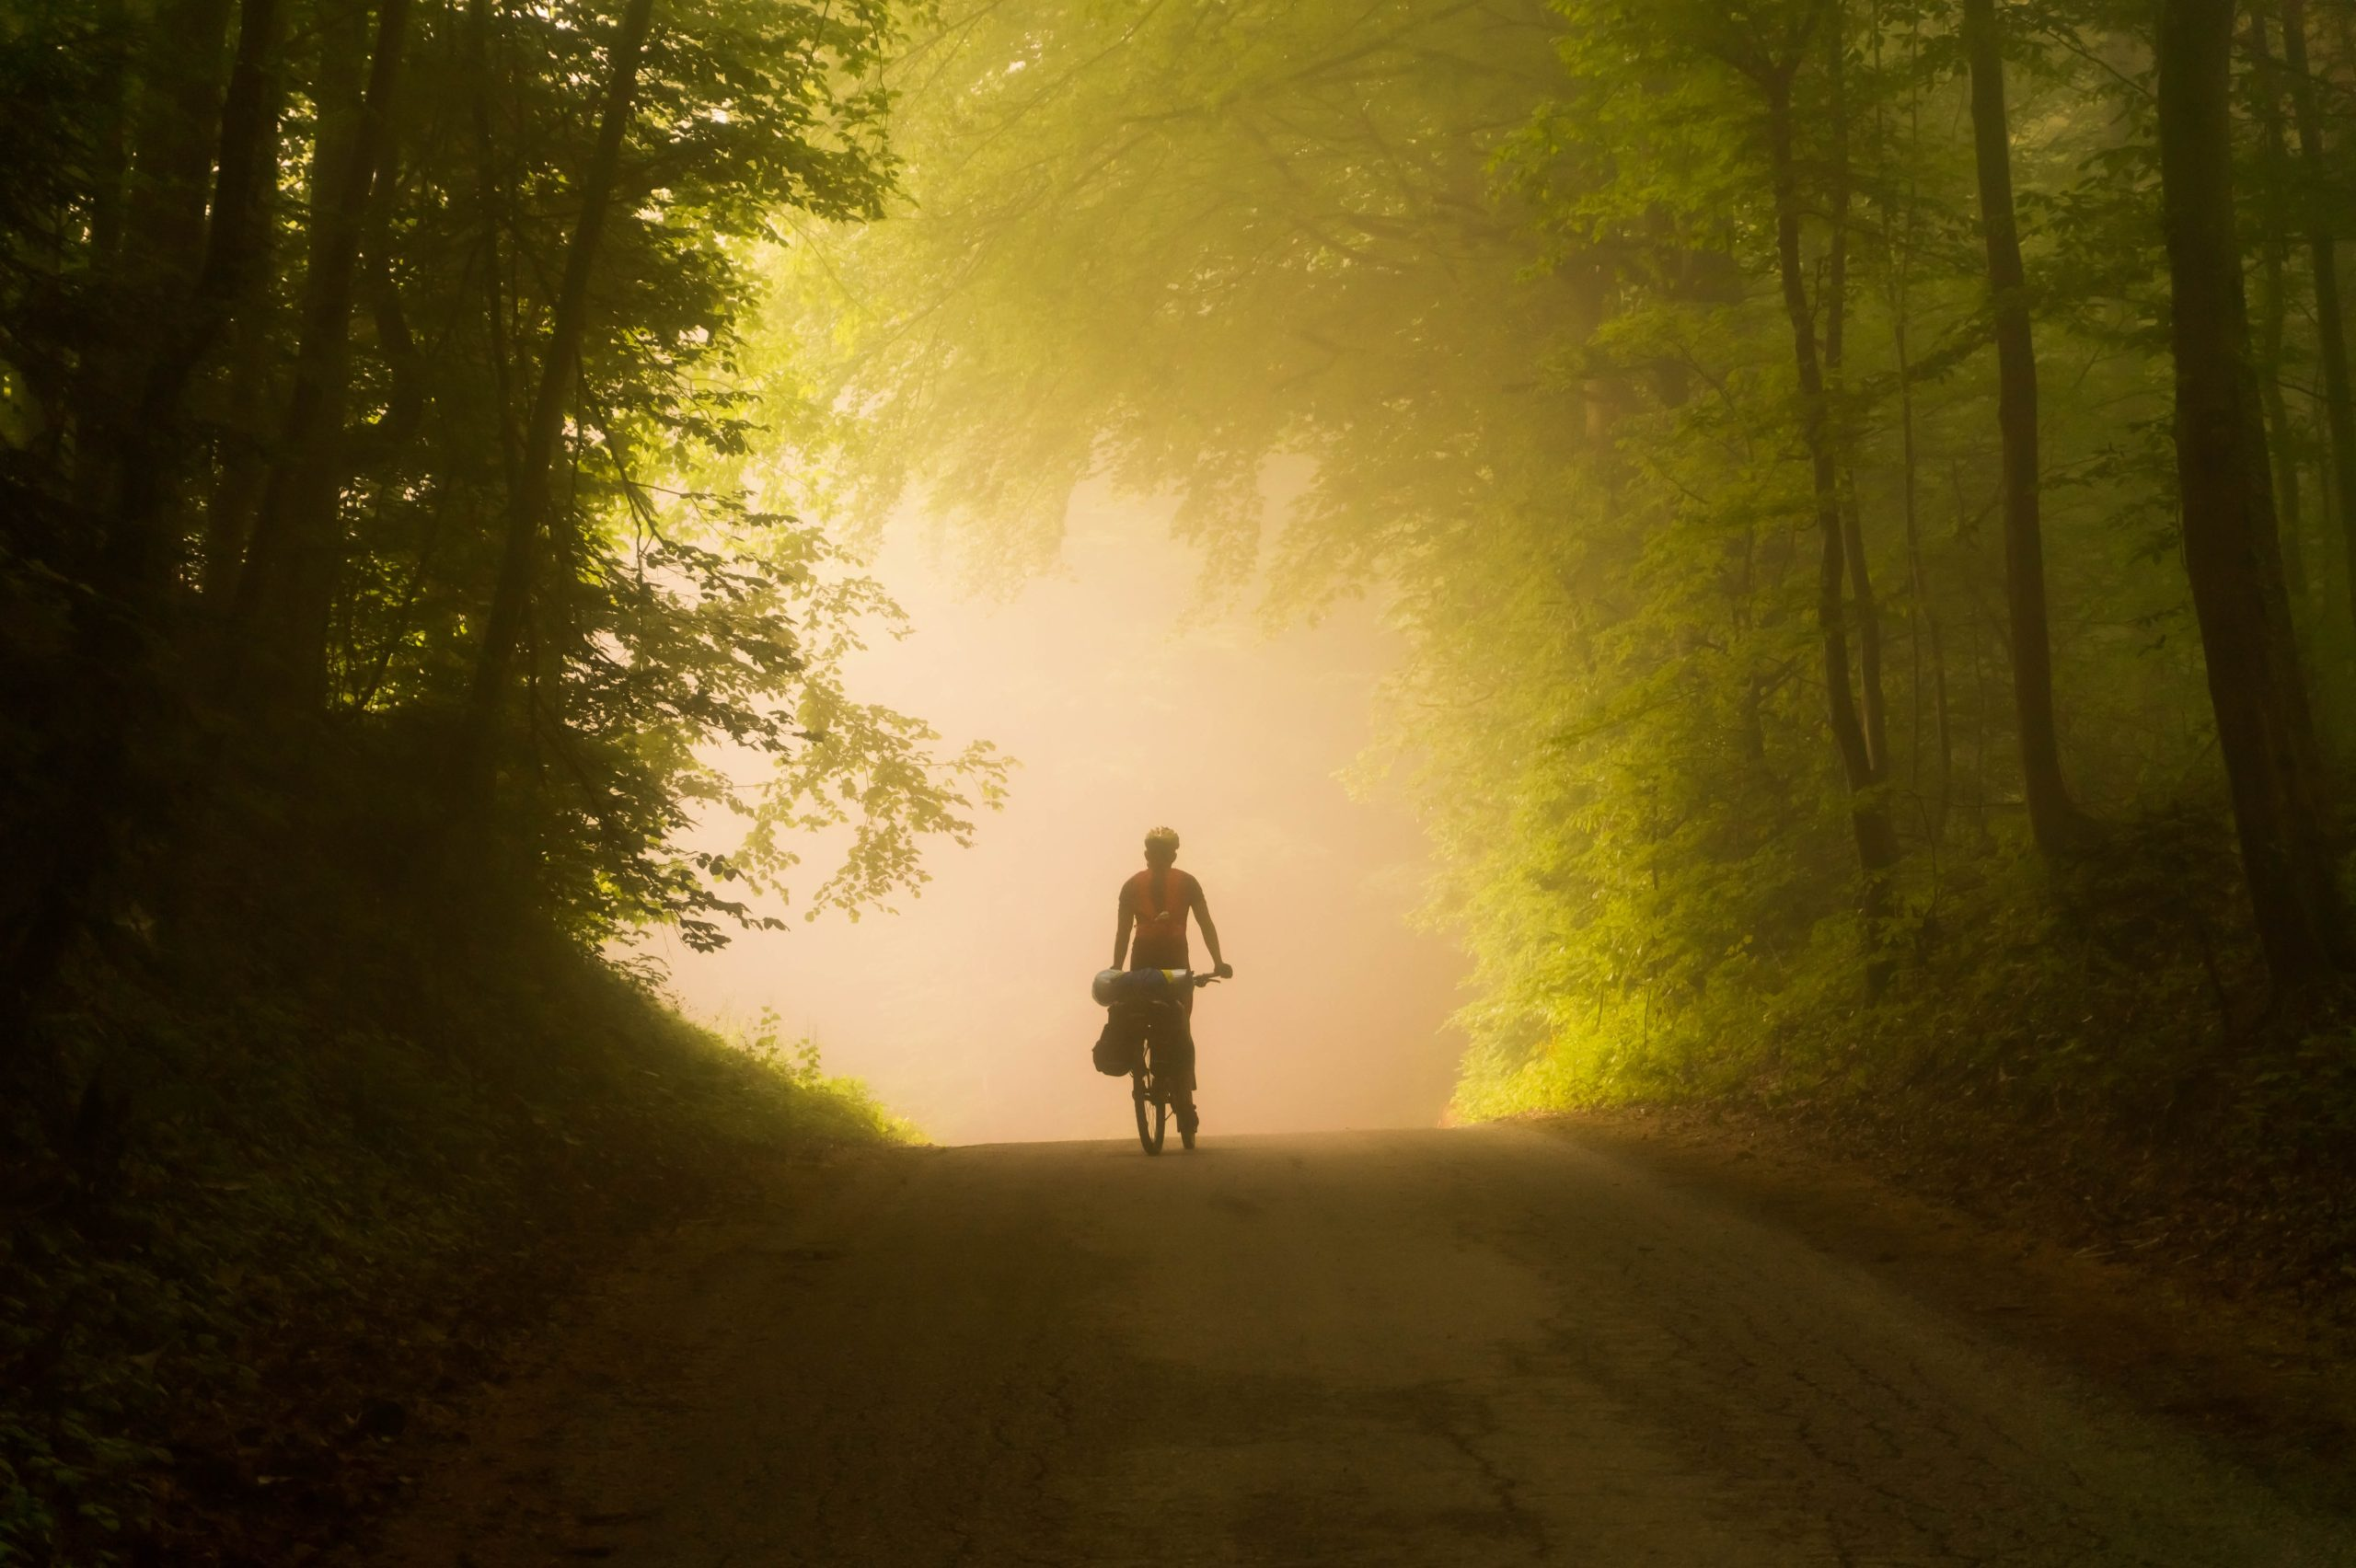 cycling-safety-fall-traffic